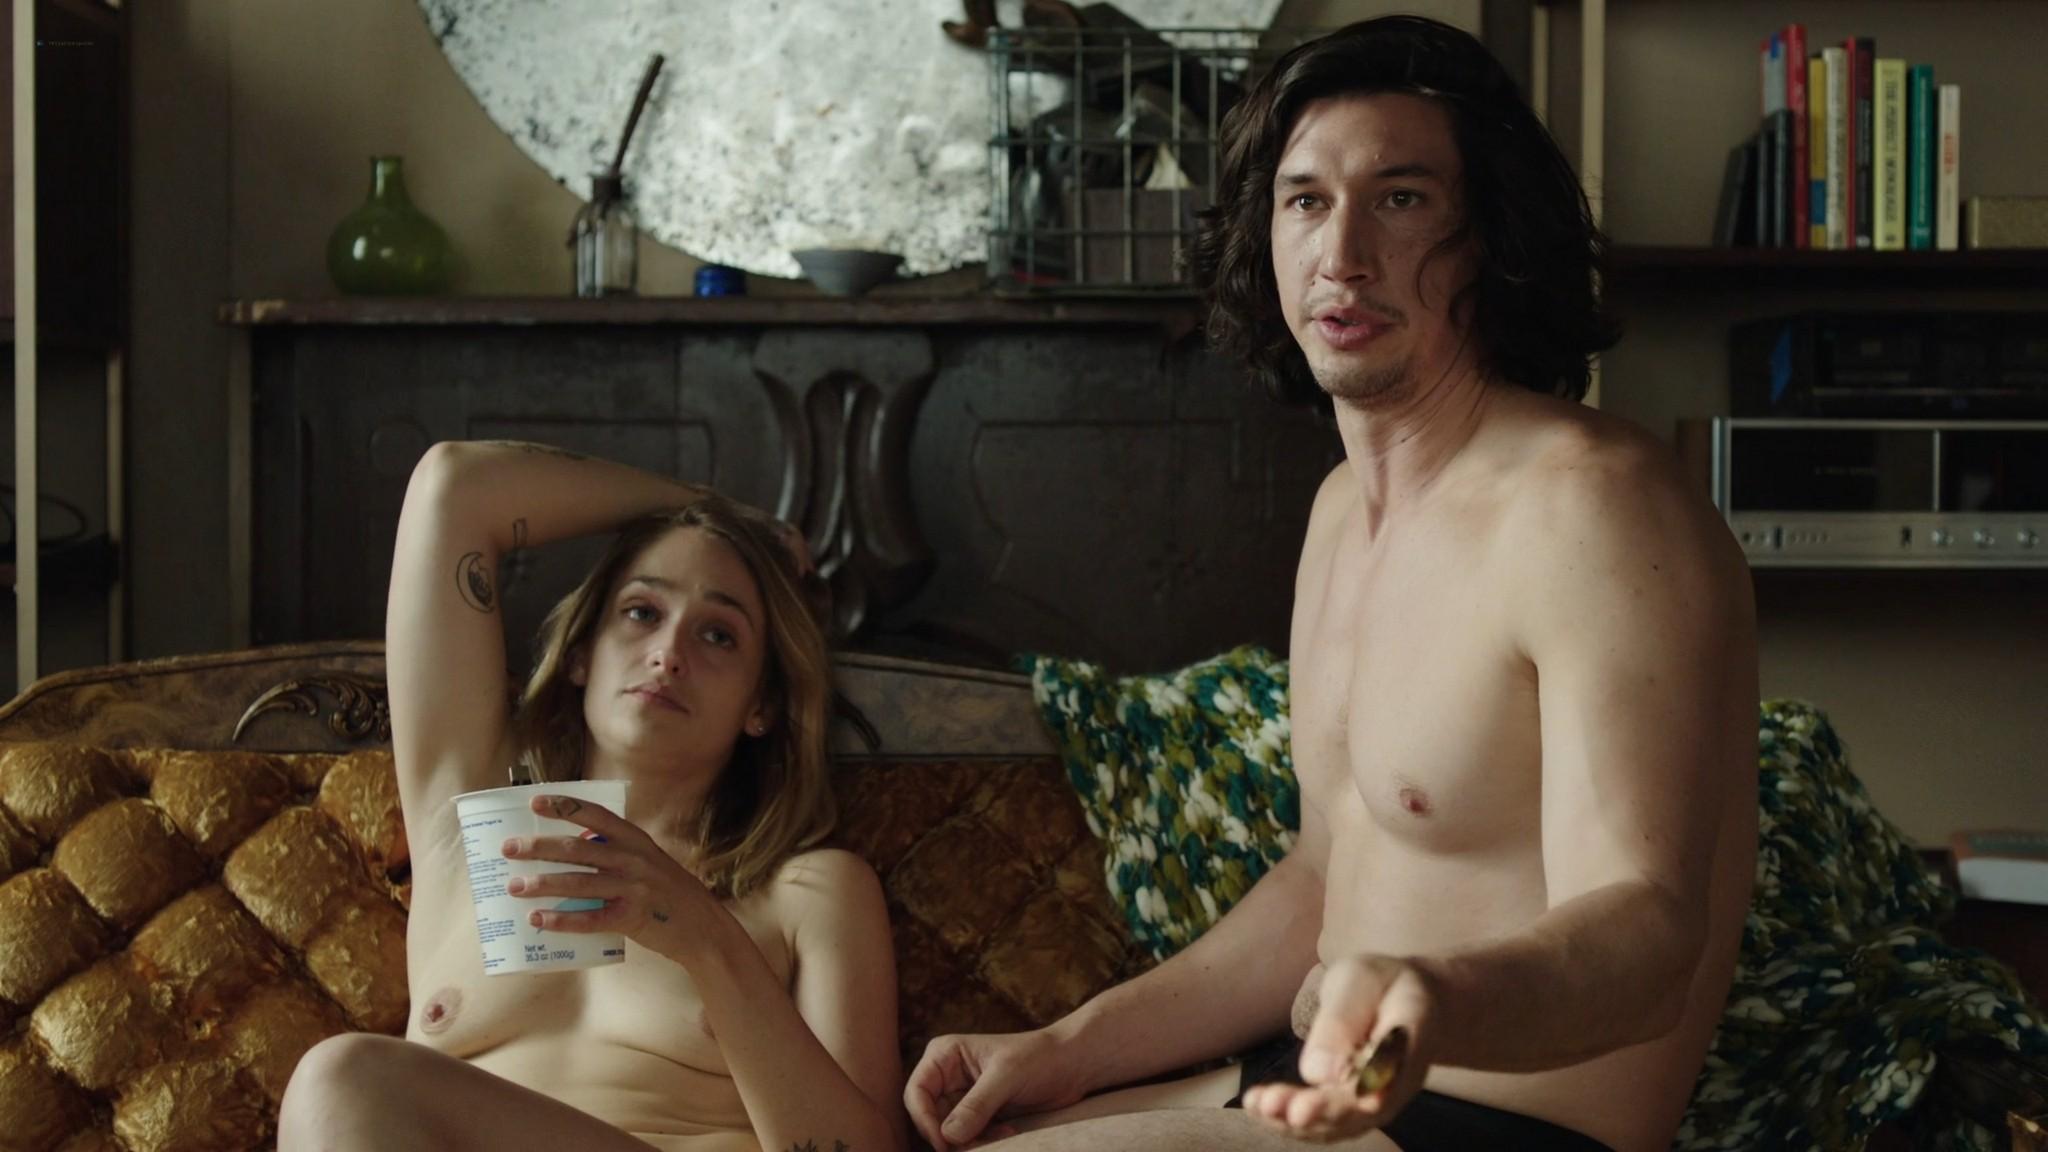 Jemima Kirke nude full frontal Lena Dunham Daisy Eagan nude Allison Williams sexy Girls 2012 s6e1 4 1080p Web